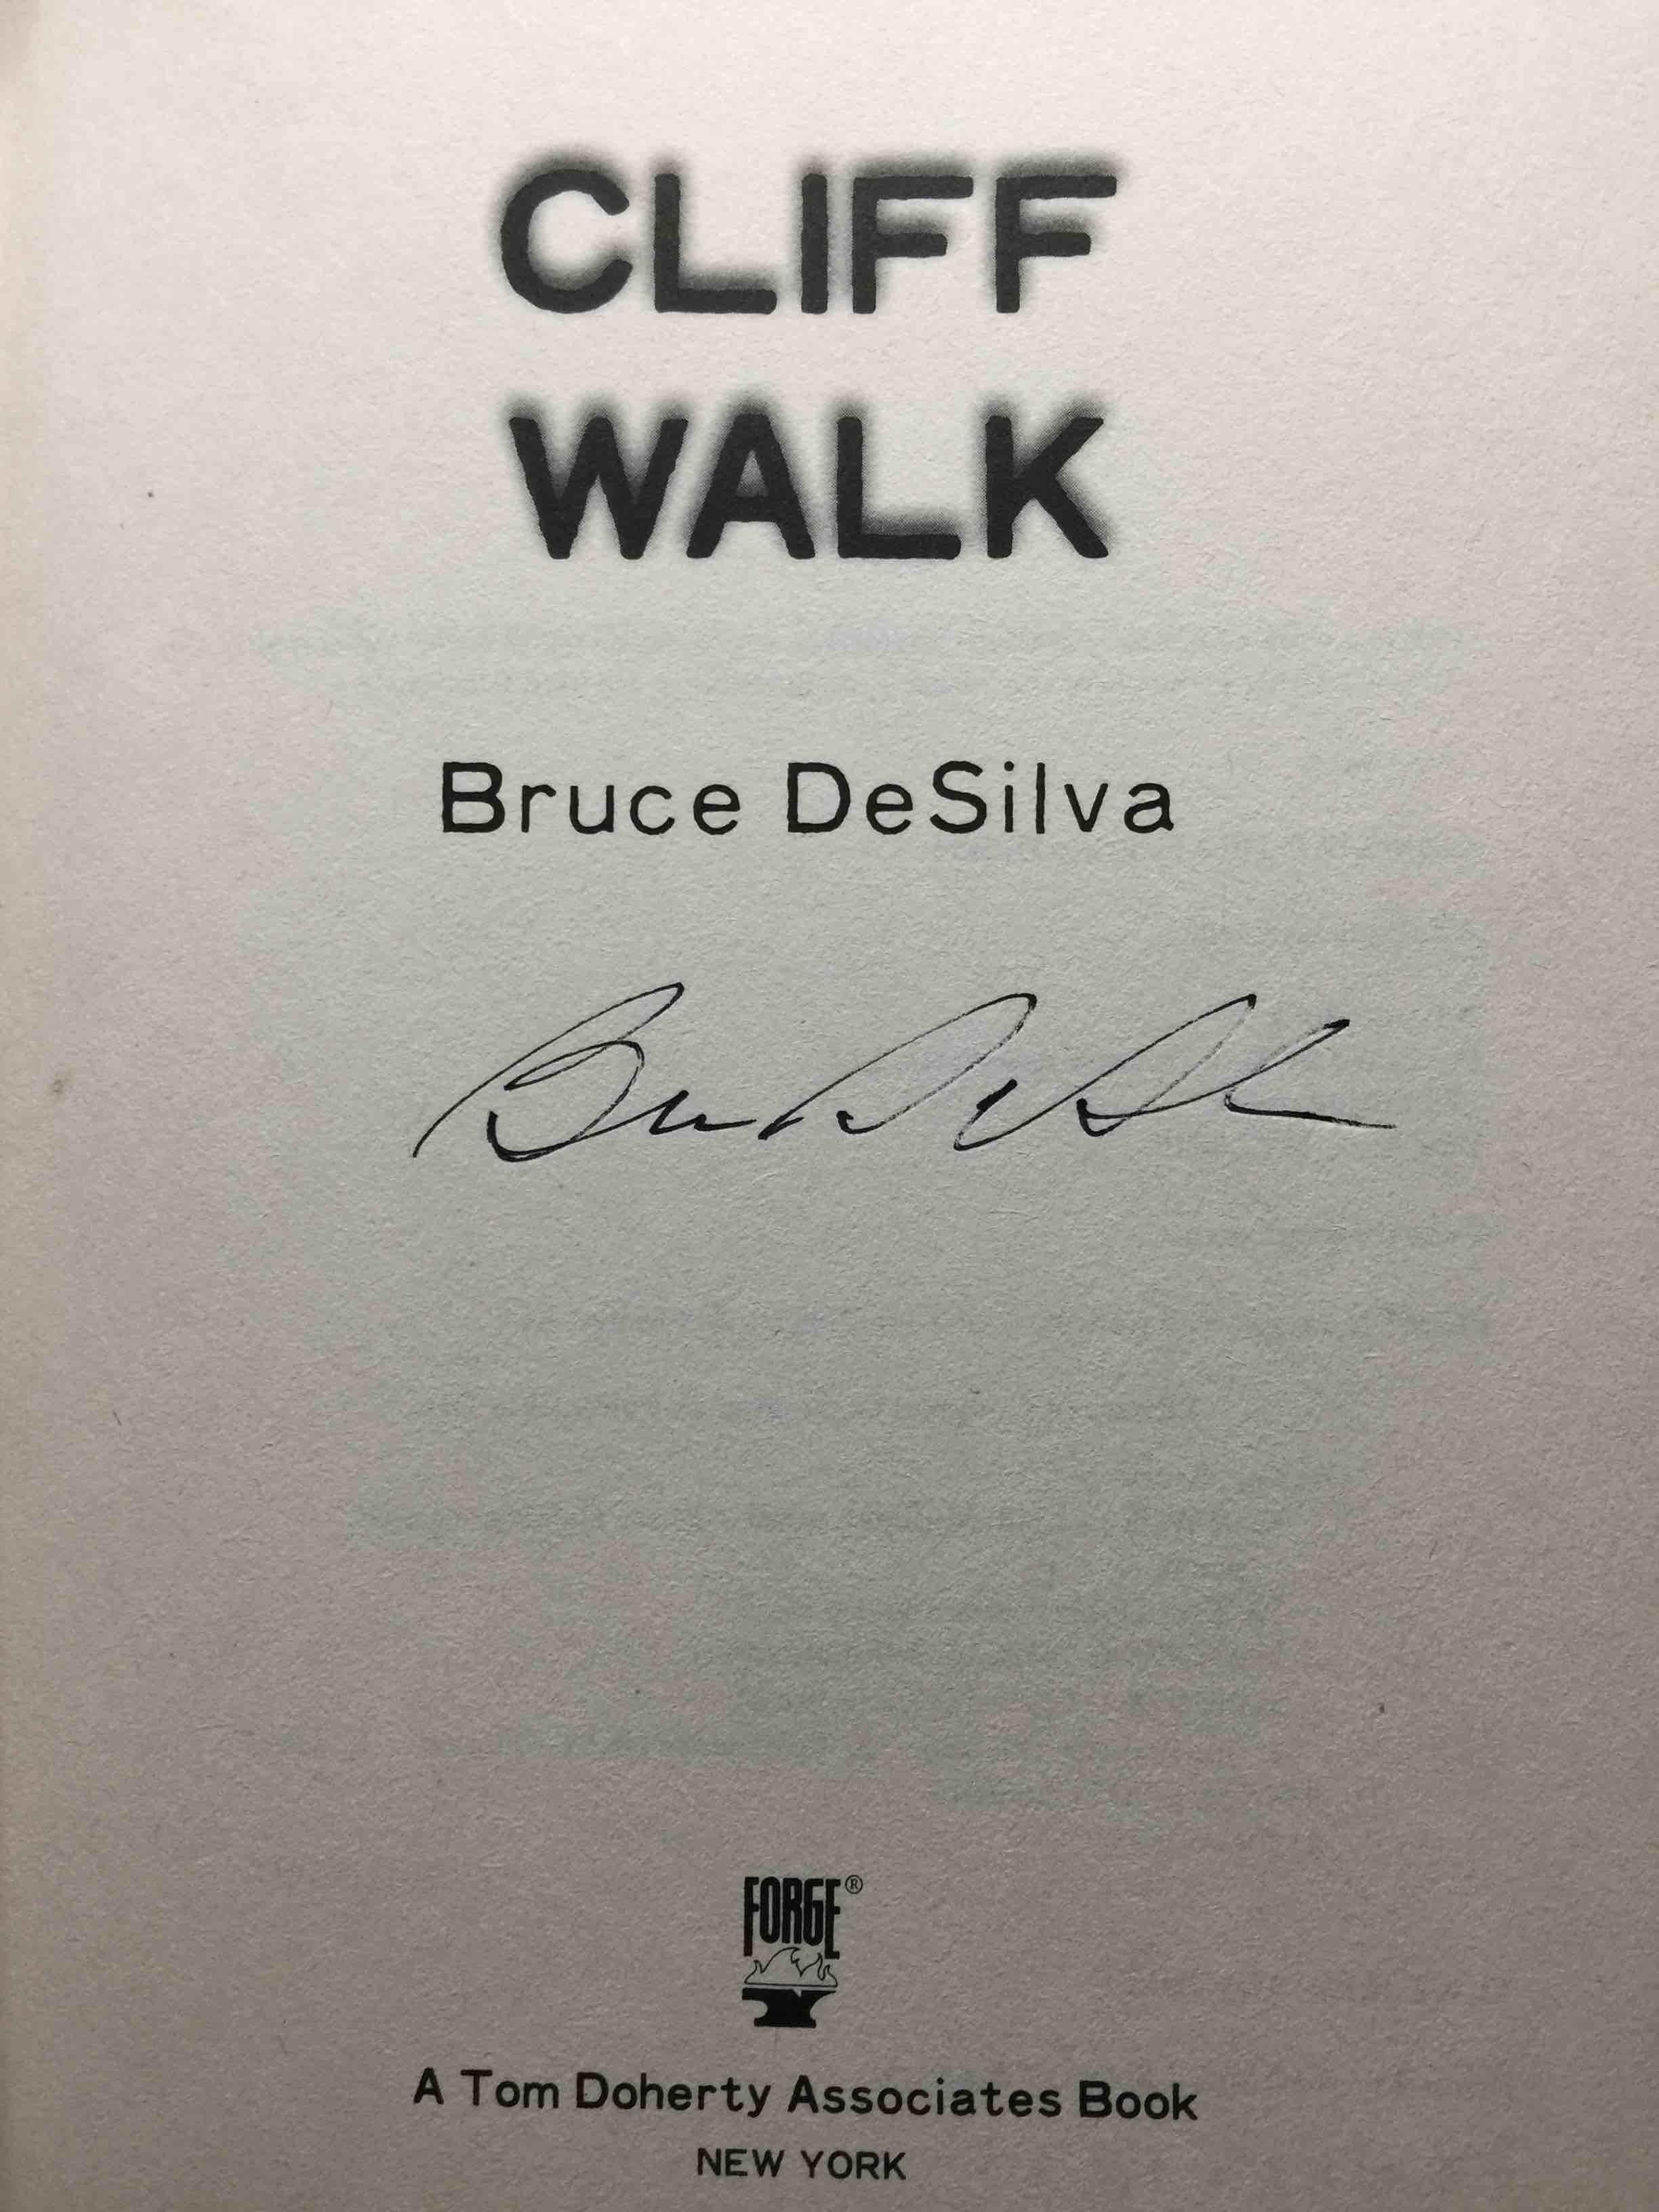 DESILVA, BRUCE. - CLIFF WALK.